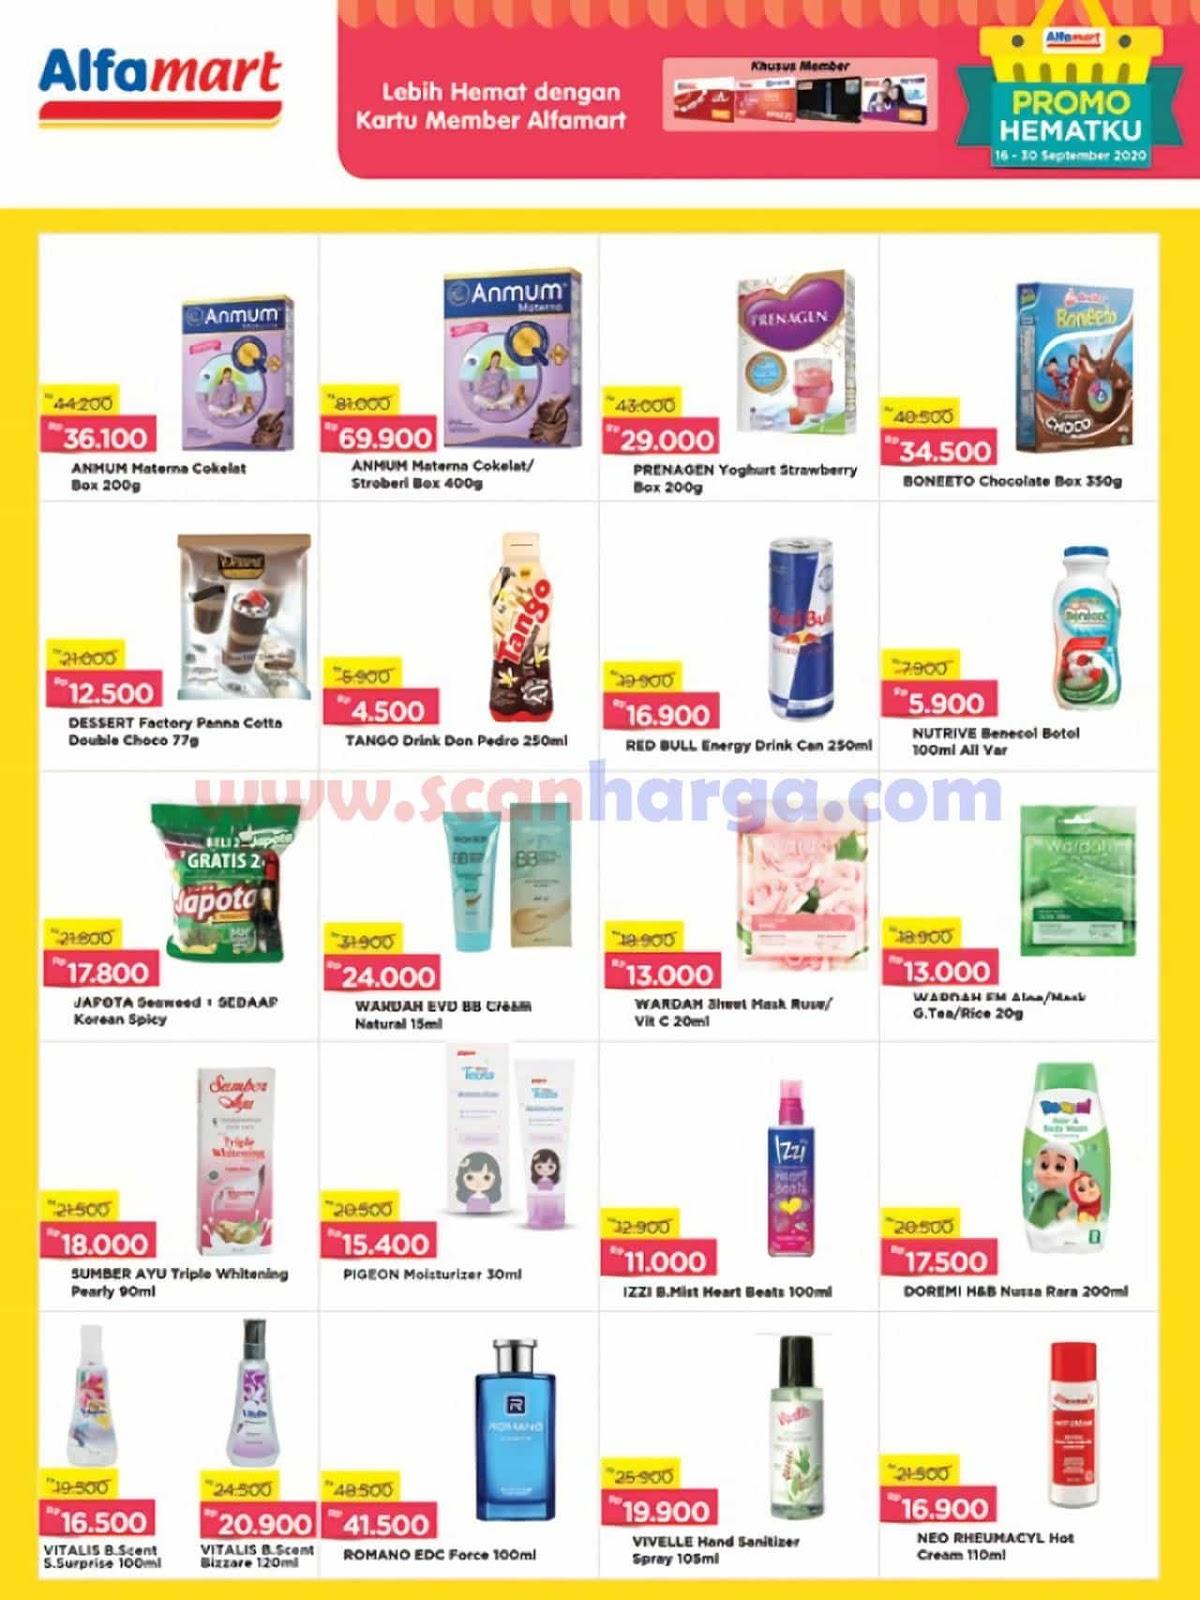 Katalog Promo Alfamart 16 - 30 September 2020 16